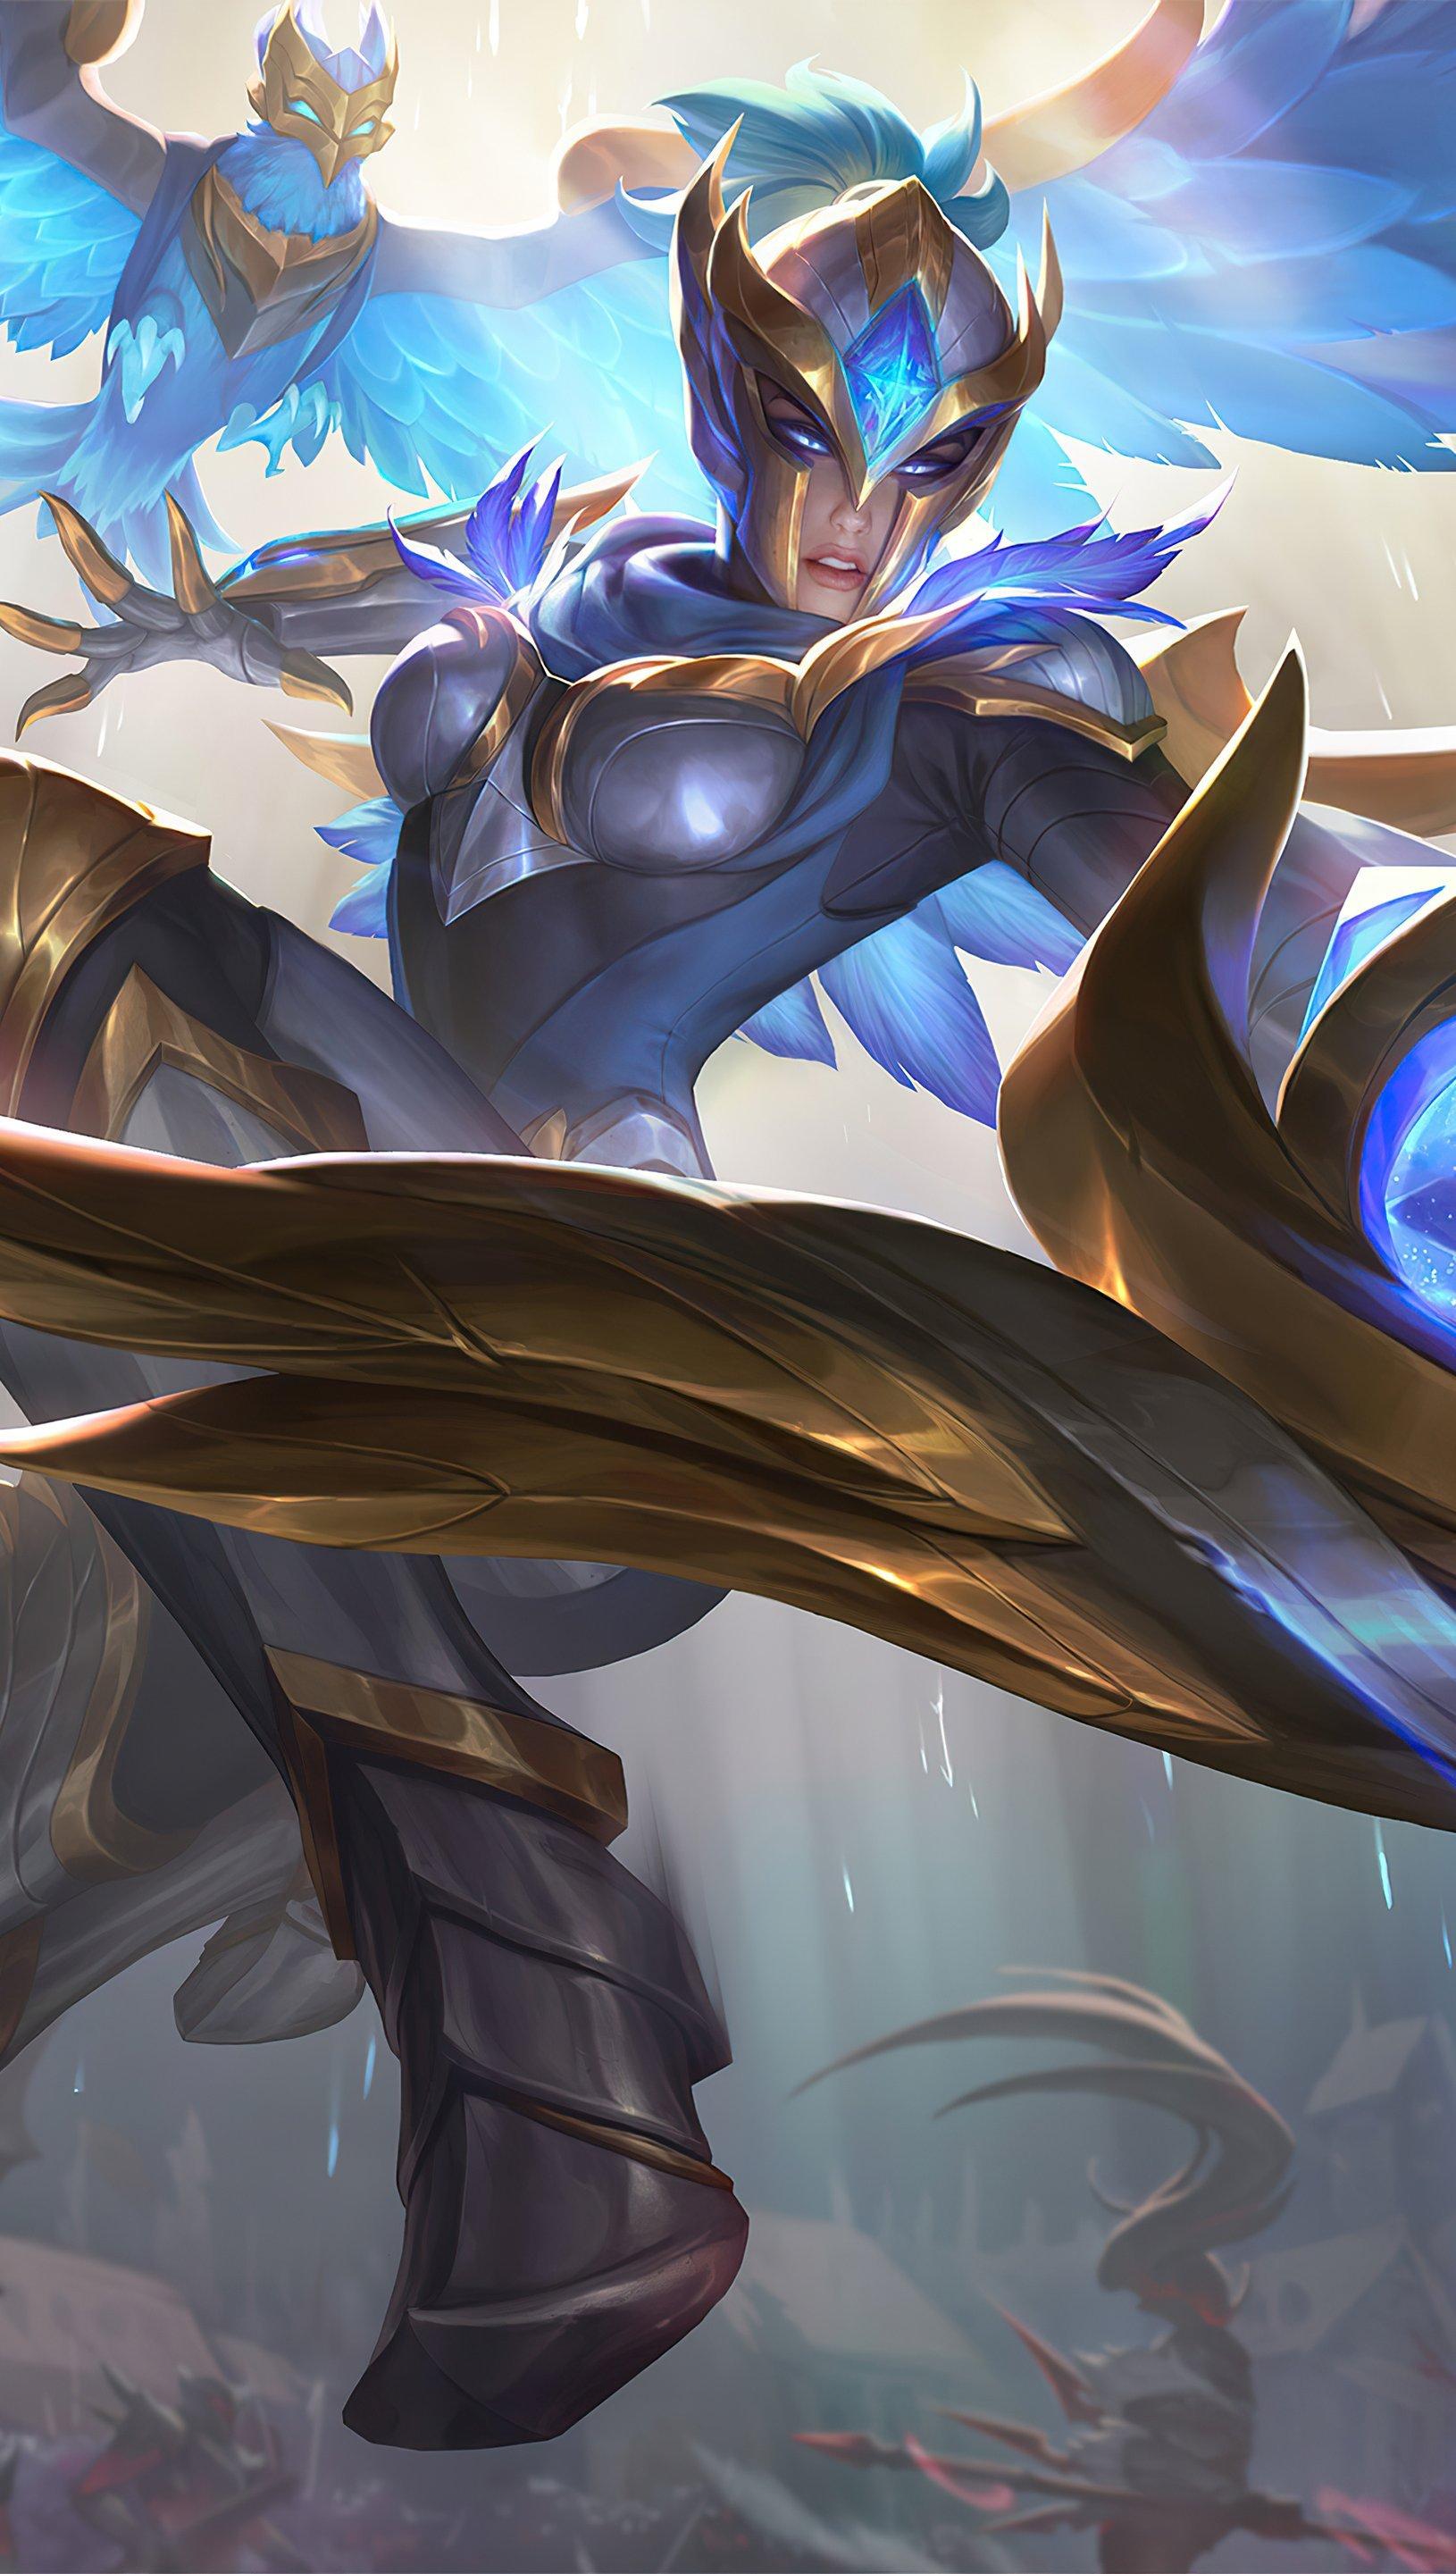 Fondos de pantalla Quinn League of Legends Vertical